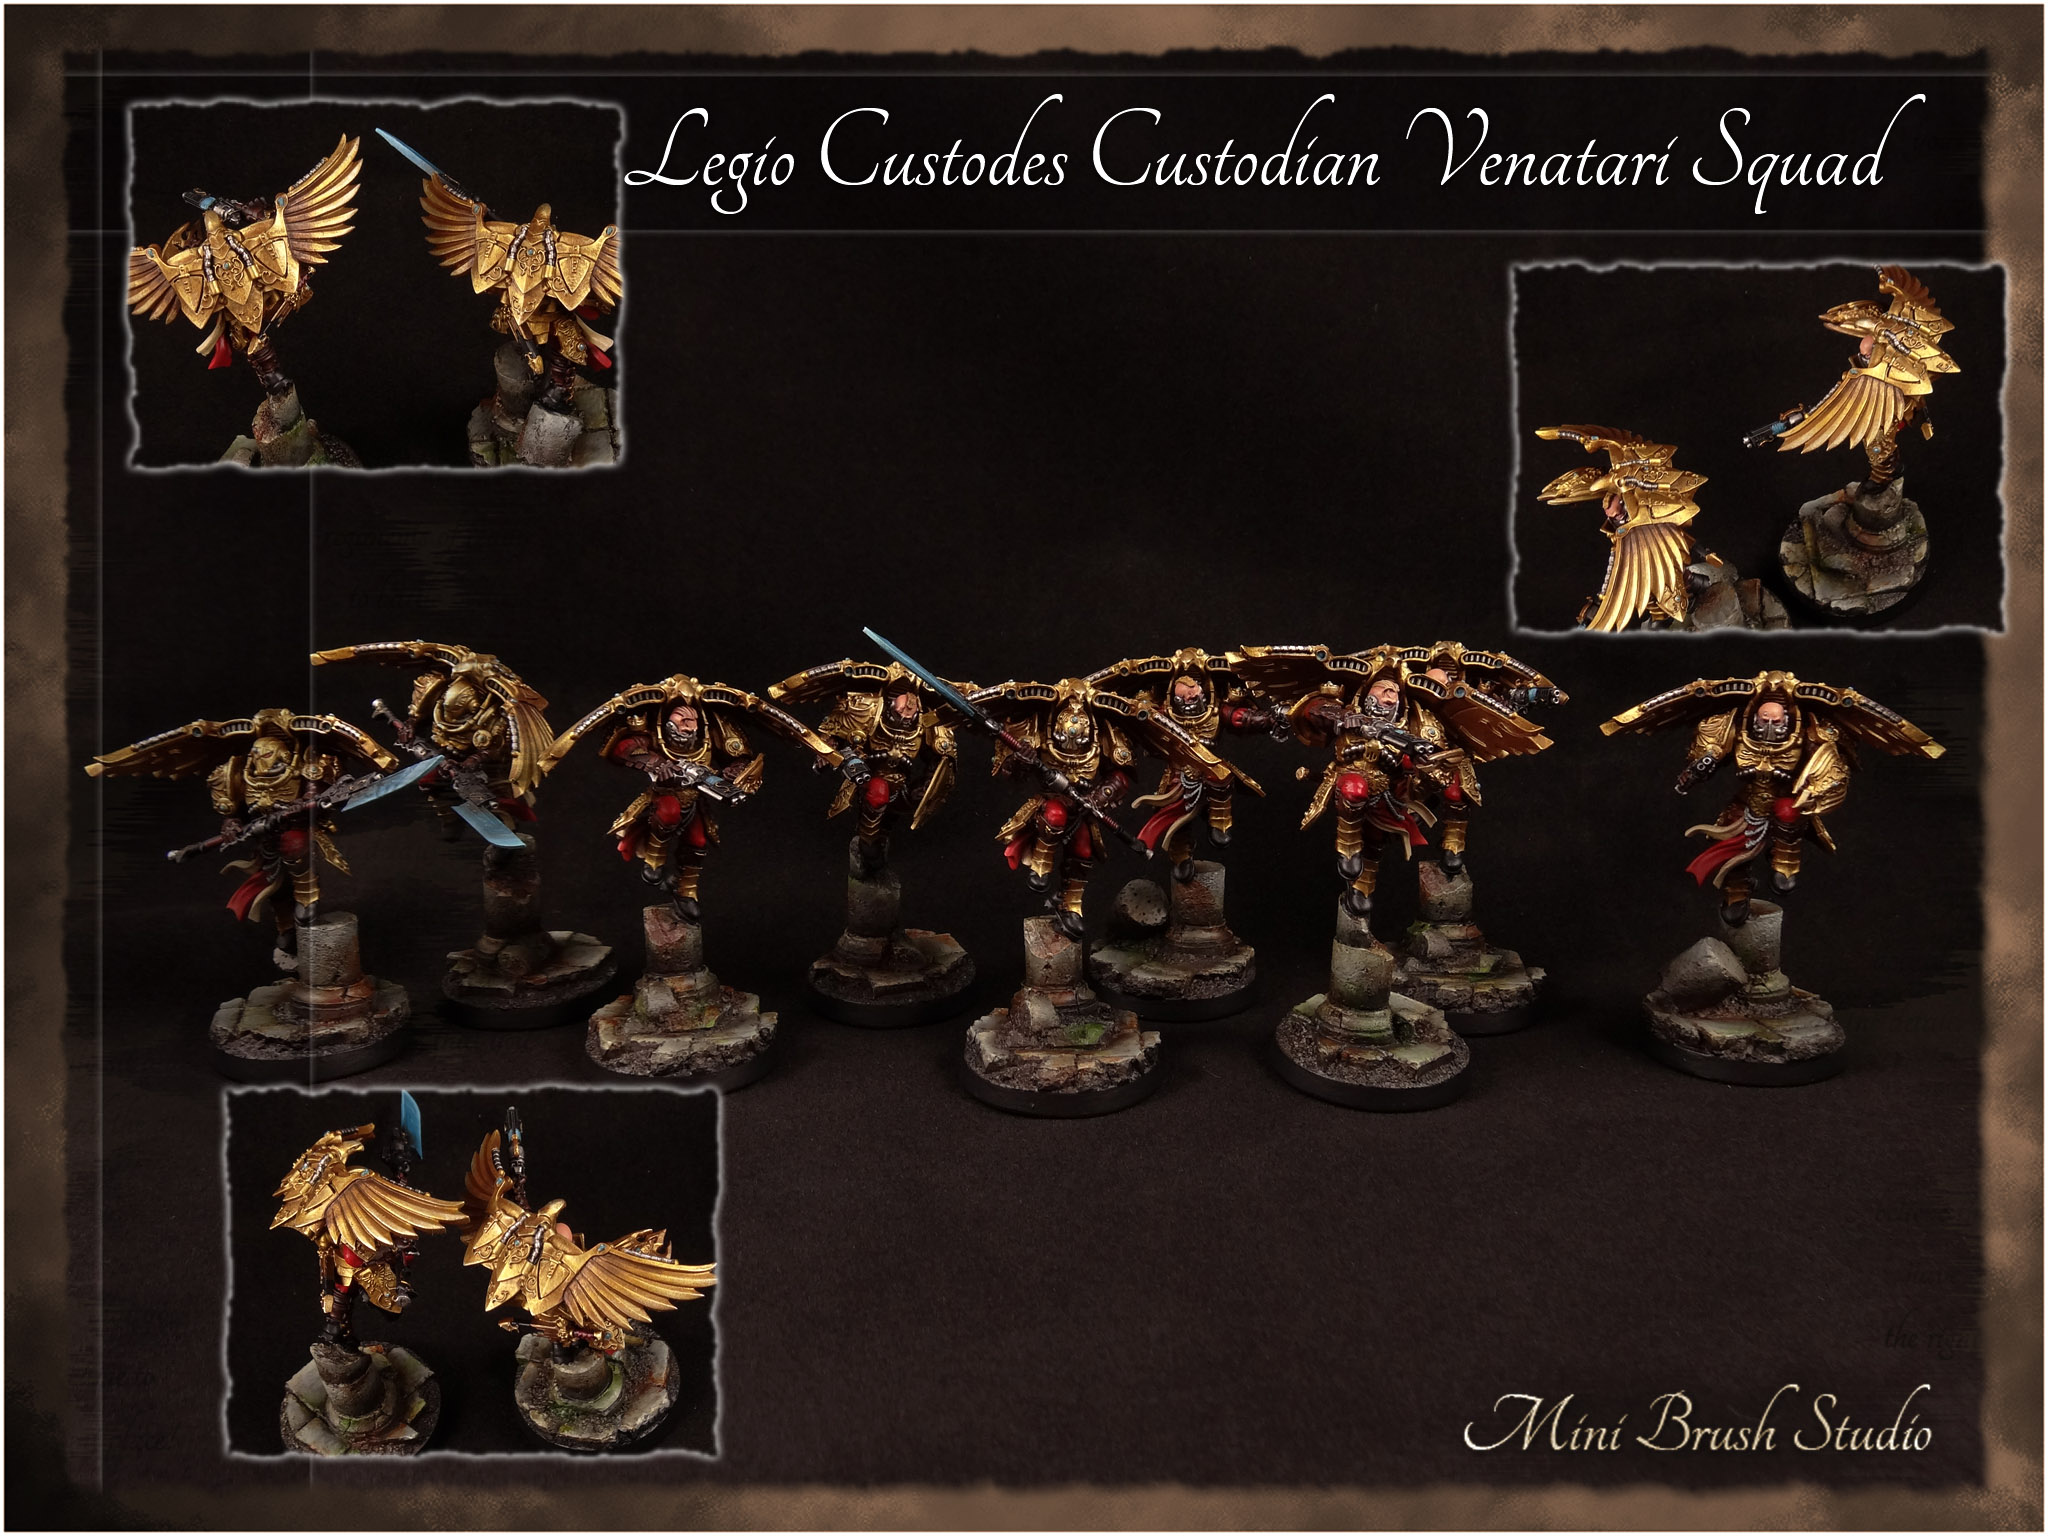 Legio Custodes Custodian Venatari Squad v7.00.jpg